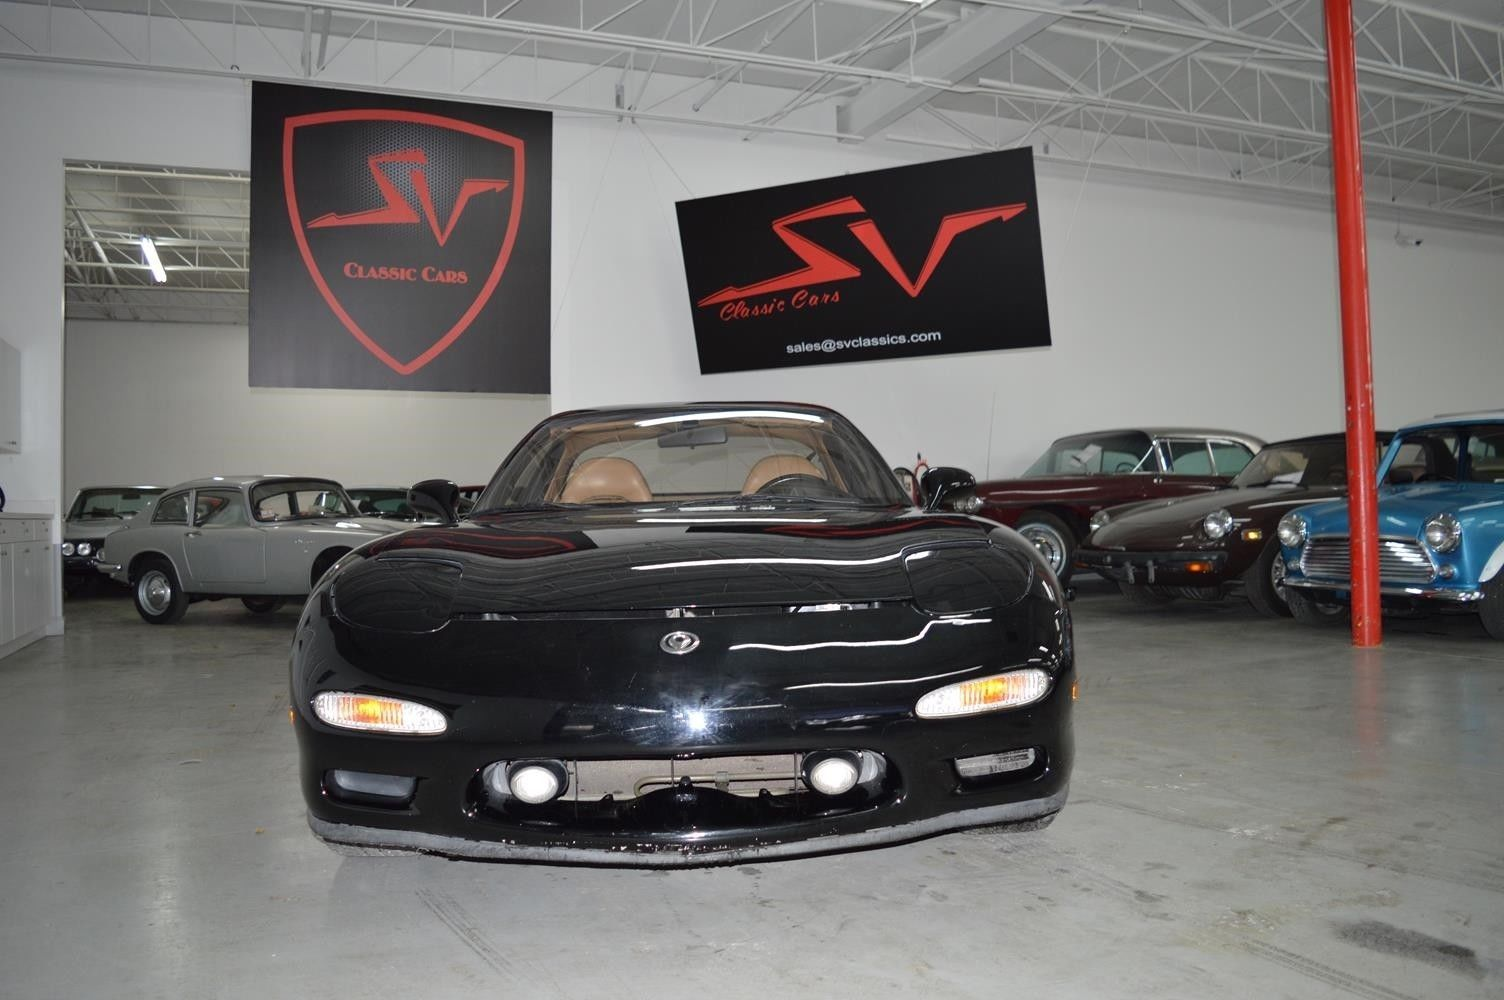 Cool Amazing 1993 Mazda RX-7 very rare car, still stock, so much ...